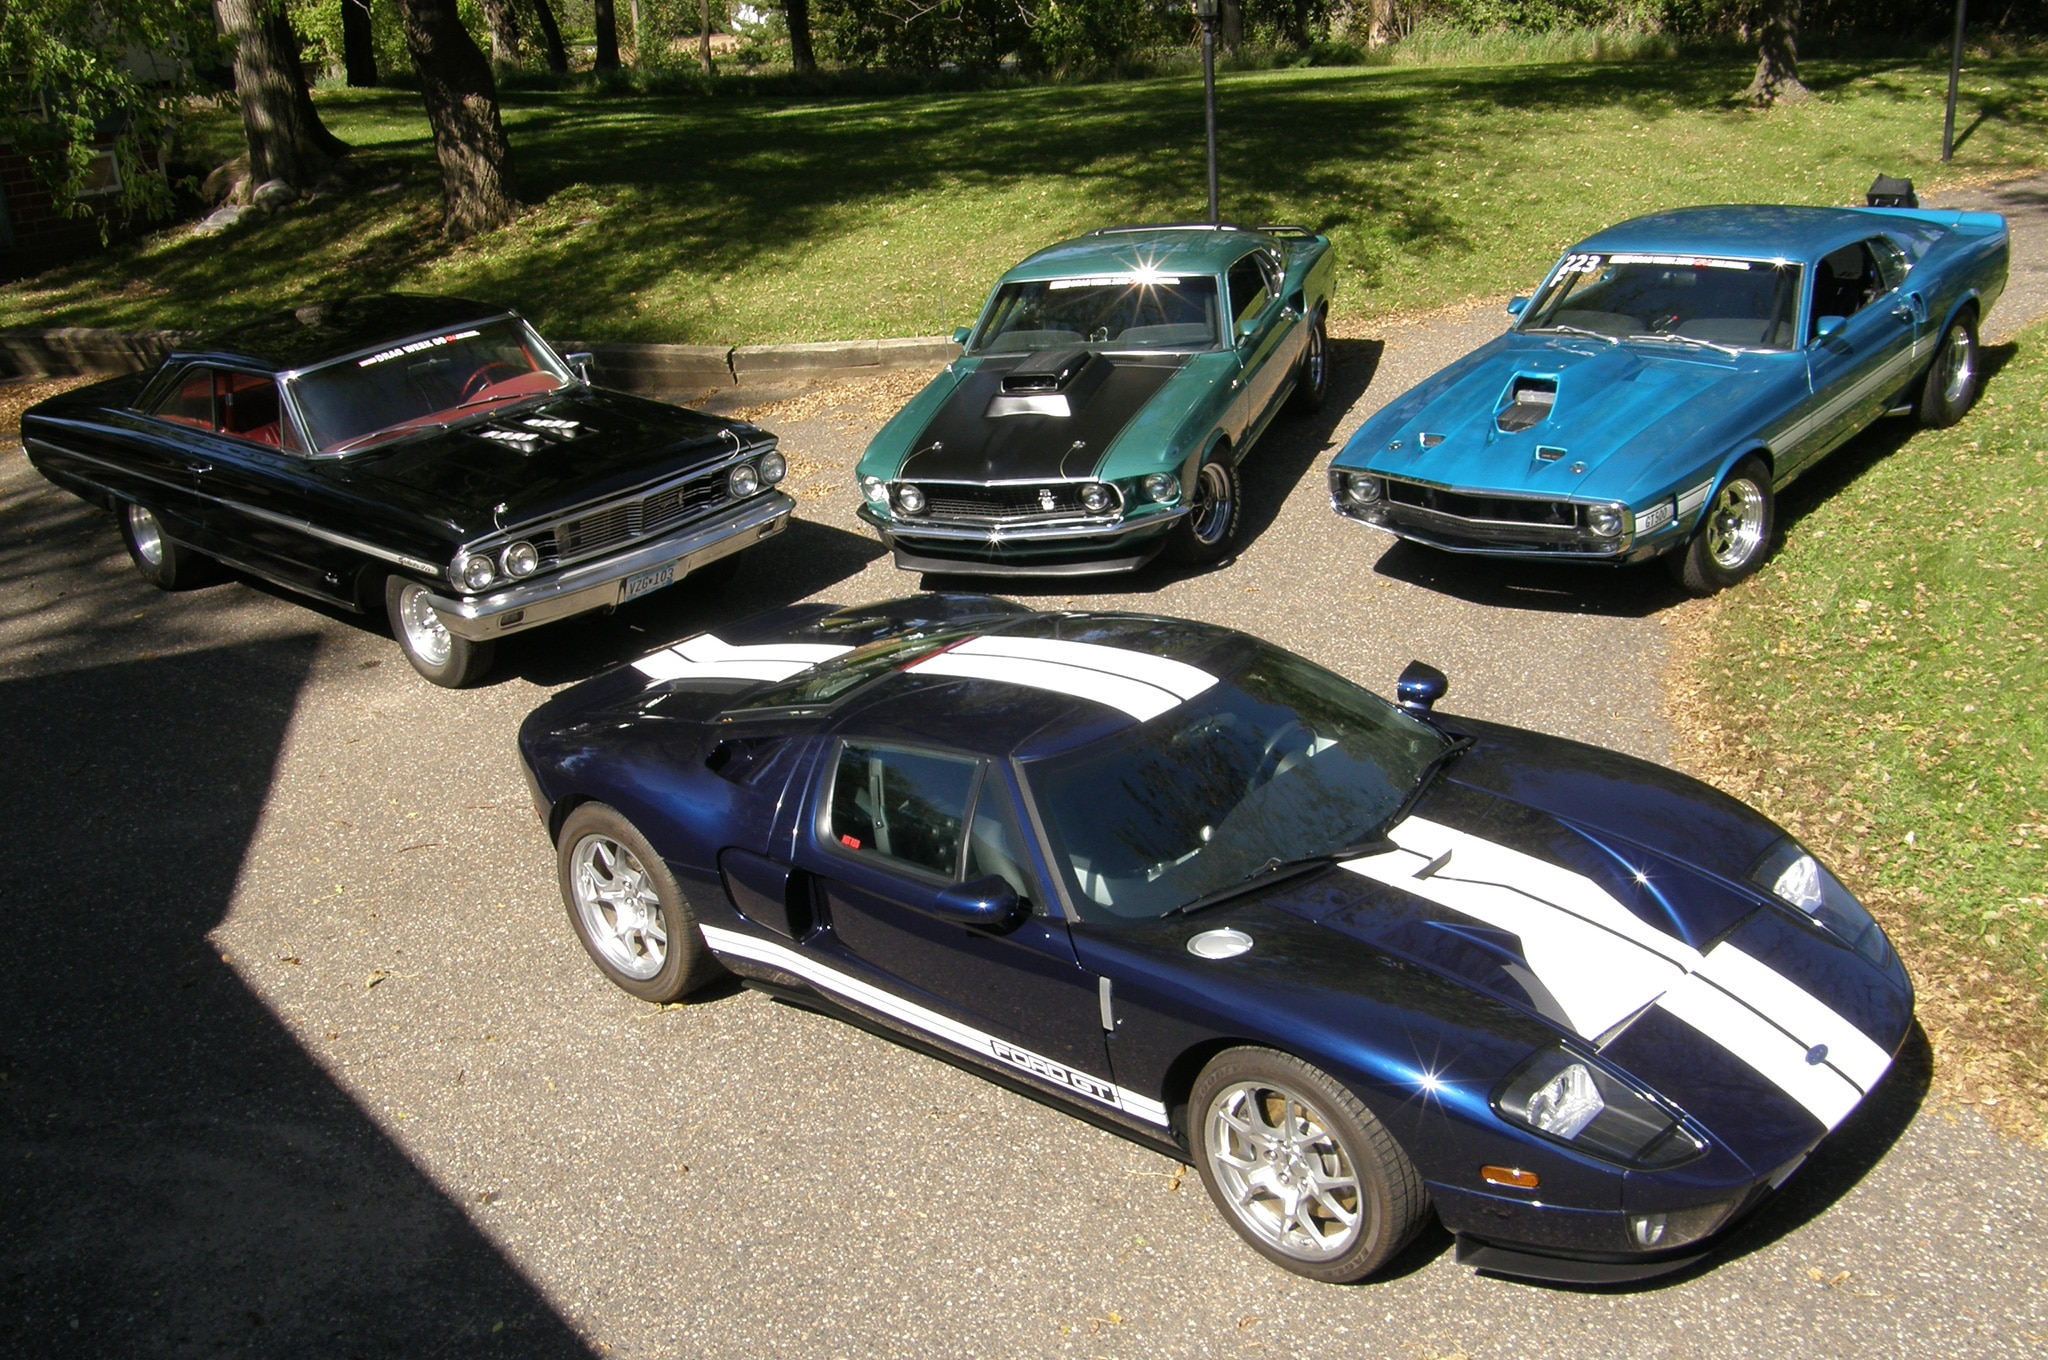 17 2009 2006 1969 2005 Ford Mustangs